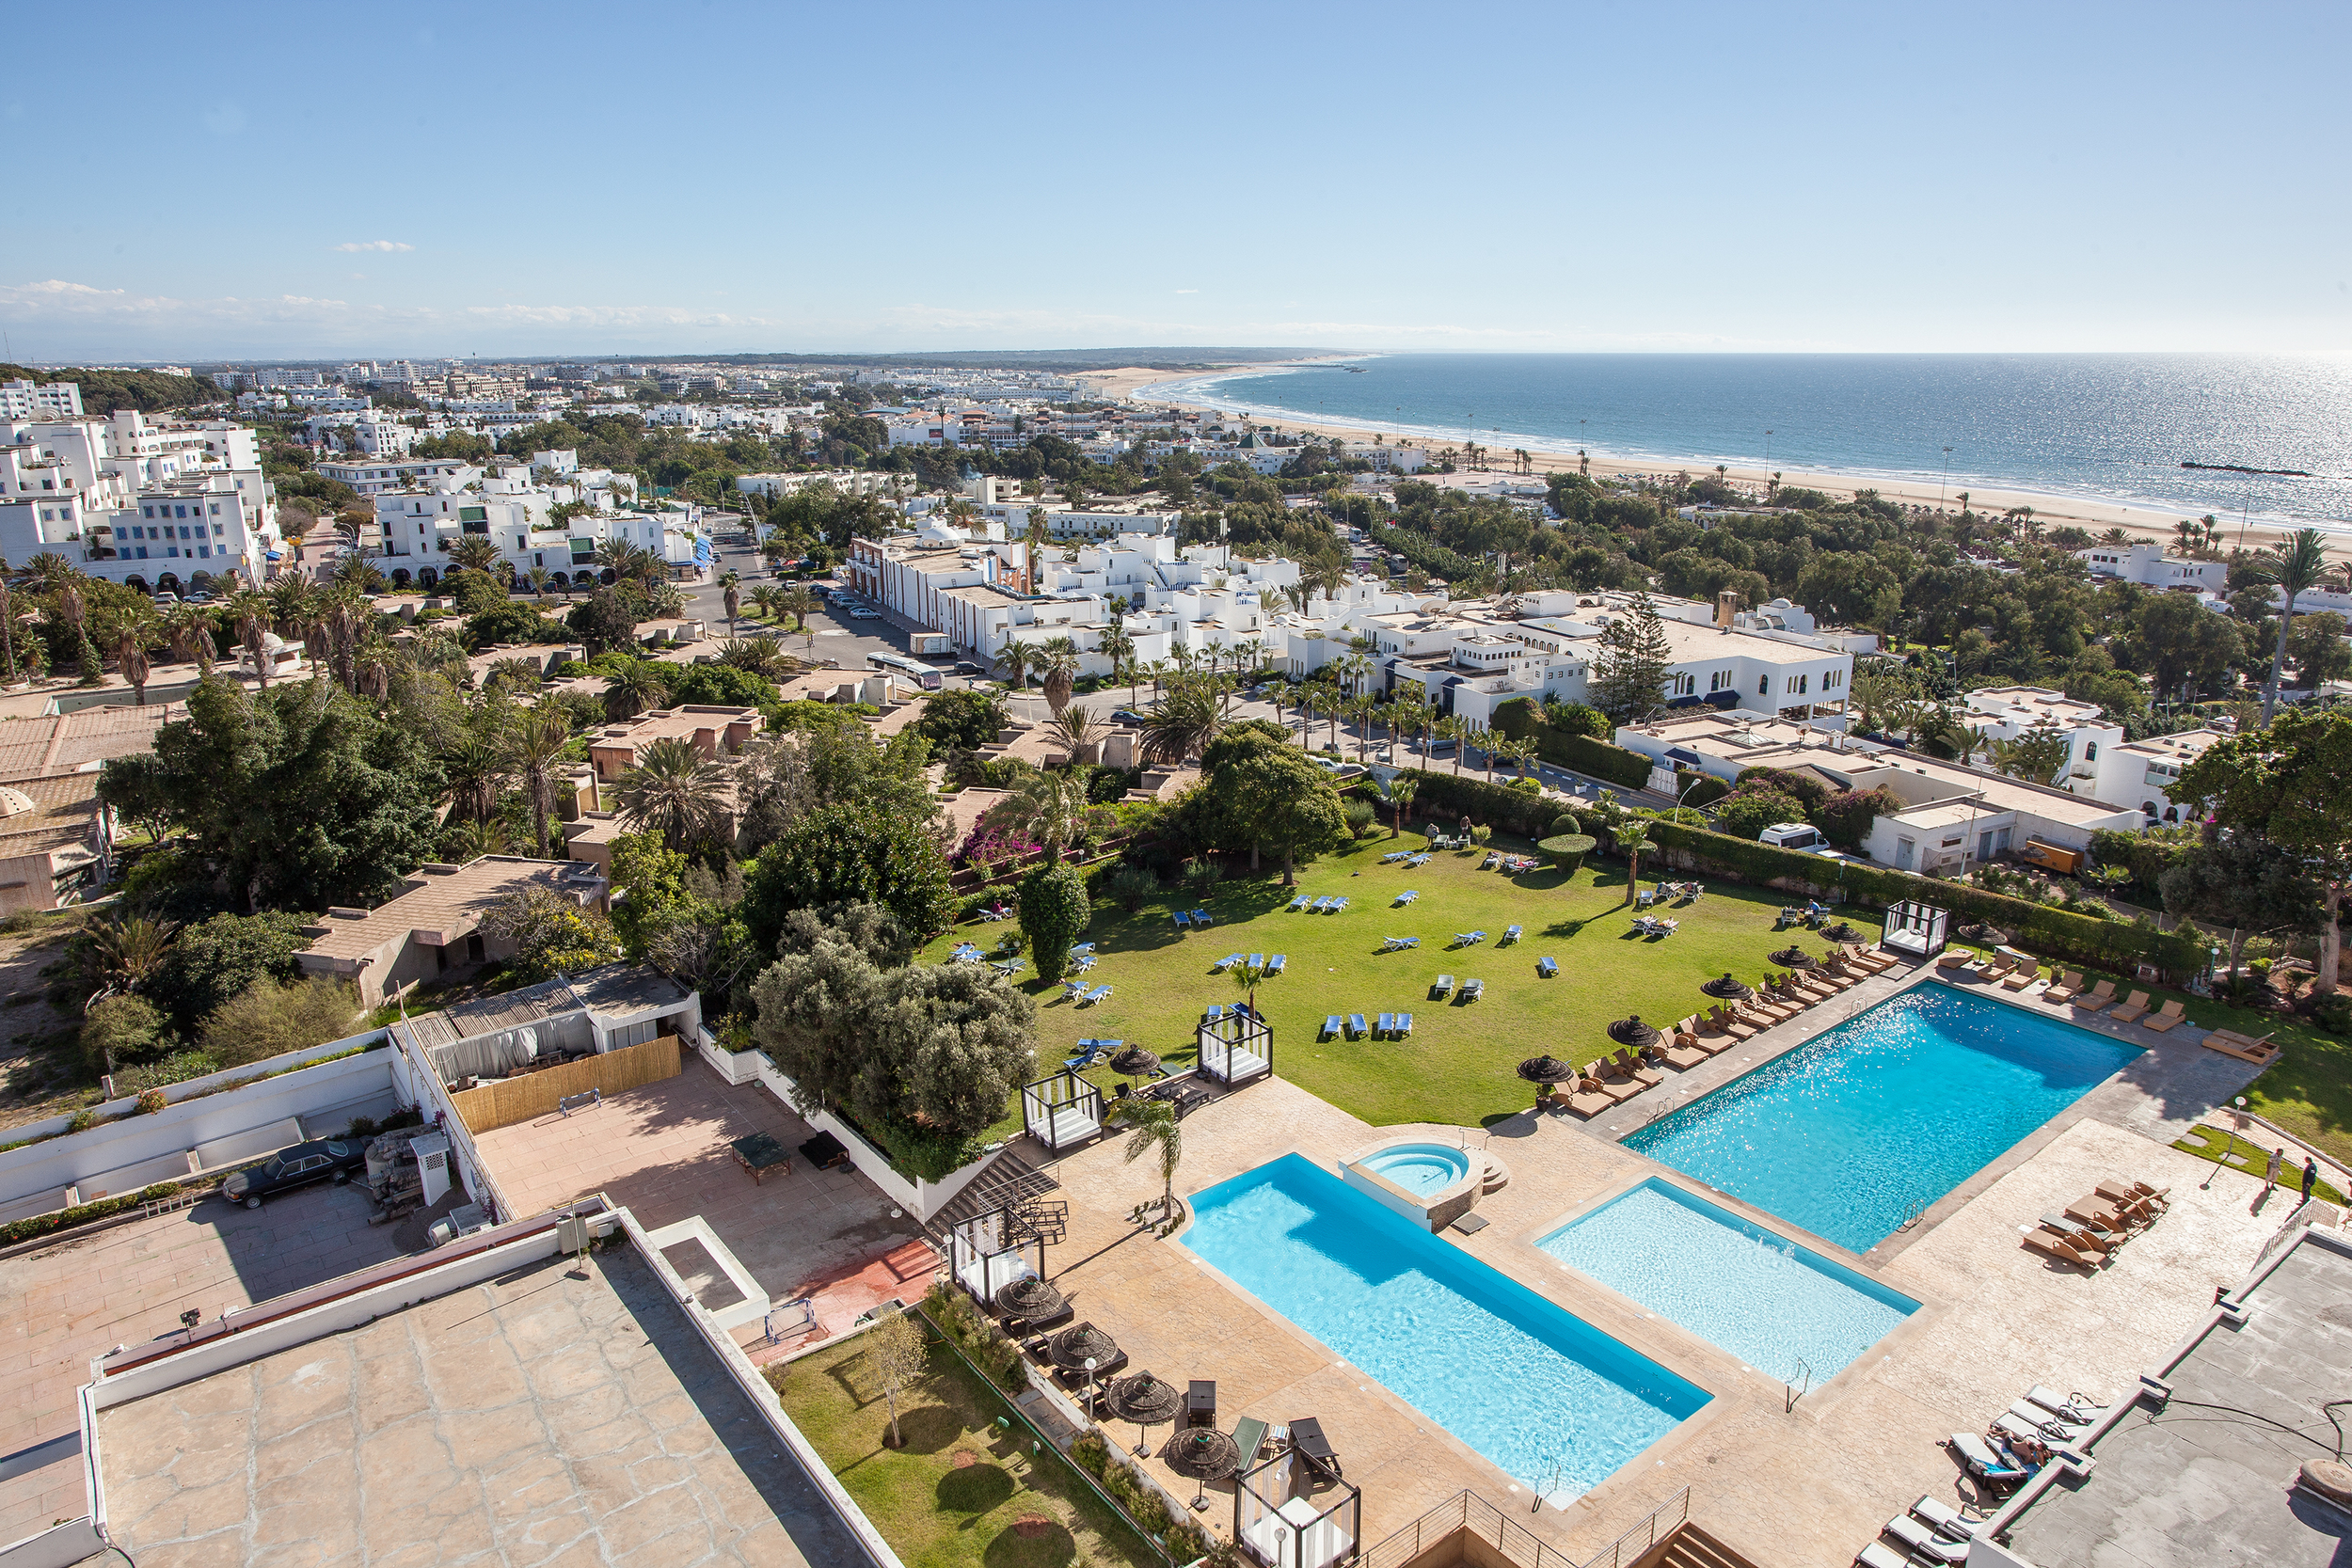 Agadir_1.jpg